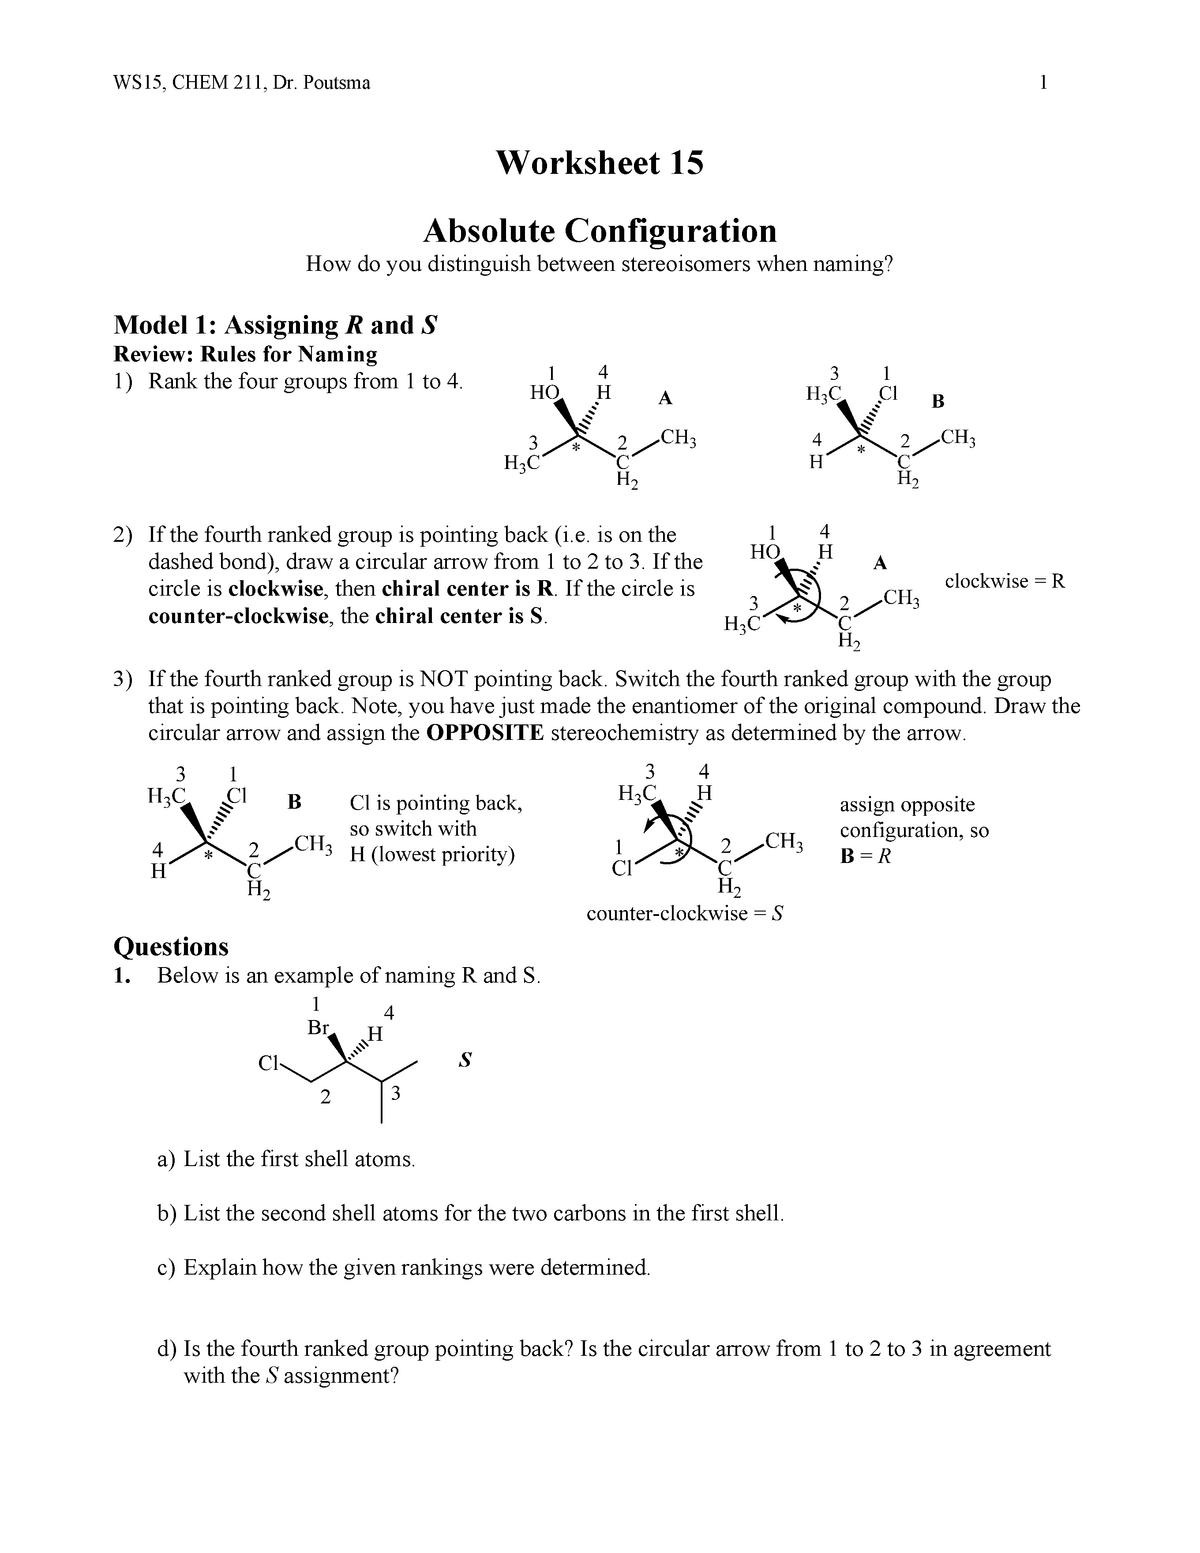 WS15 Stereoisomer Nomenclature - CHEM 211: Organic Chemistry